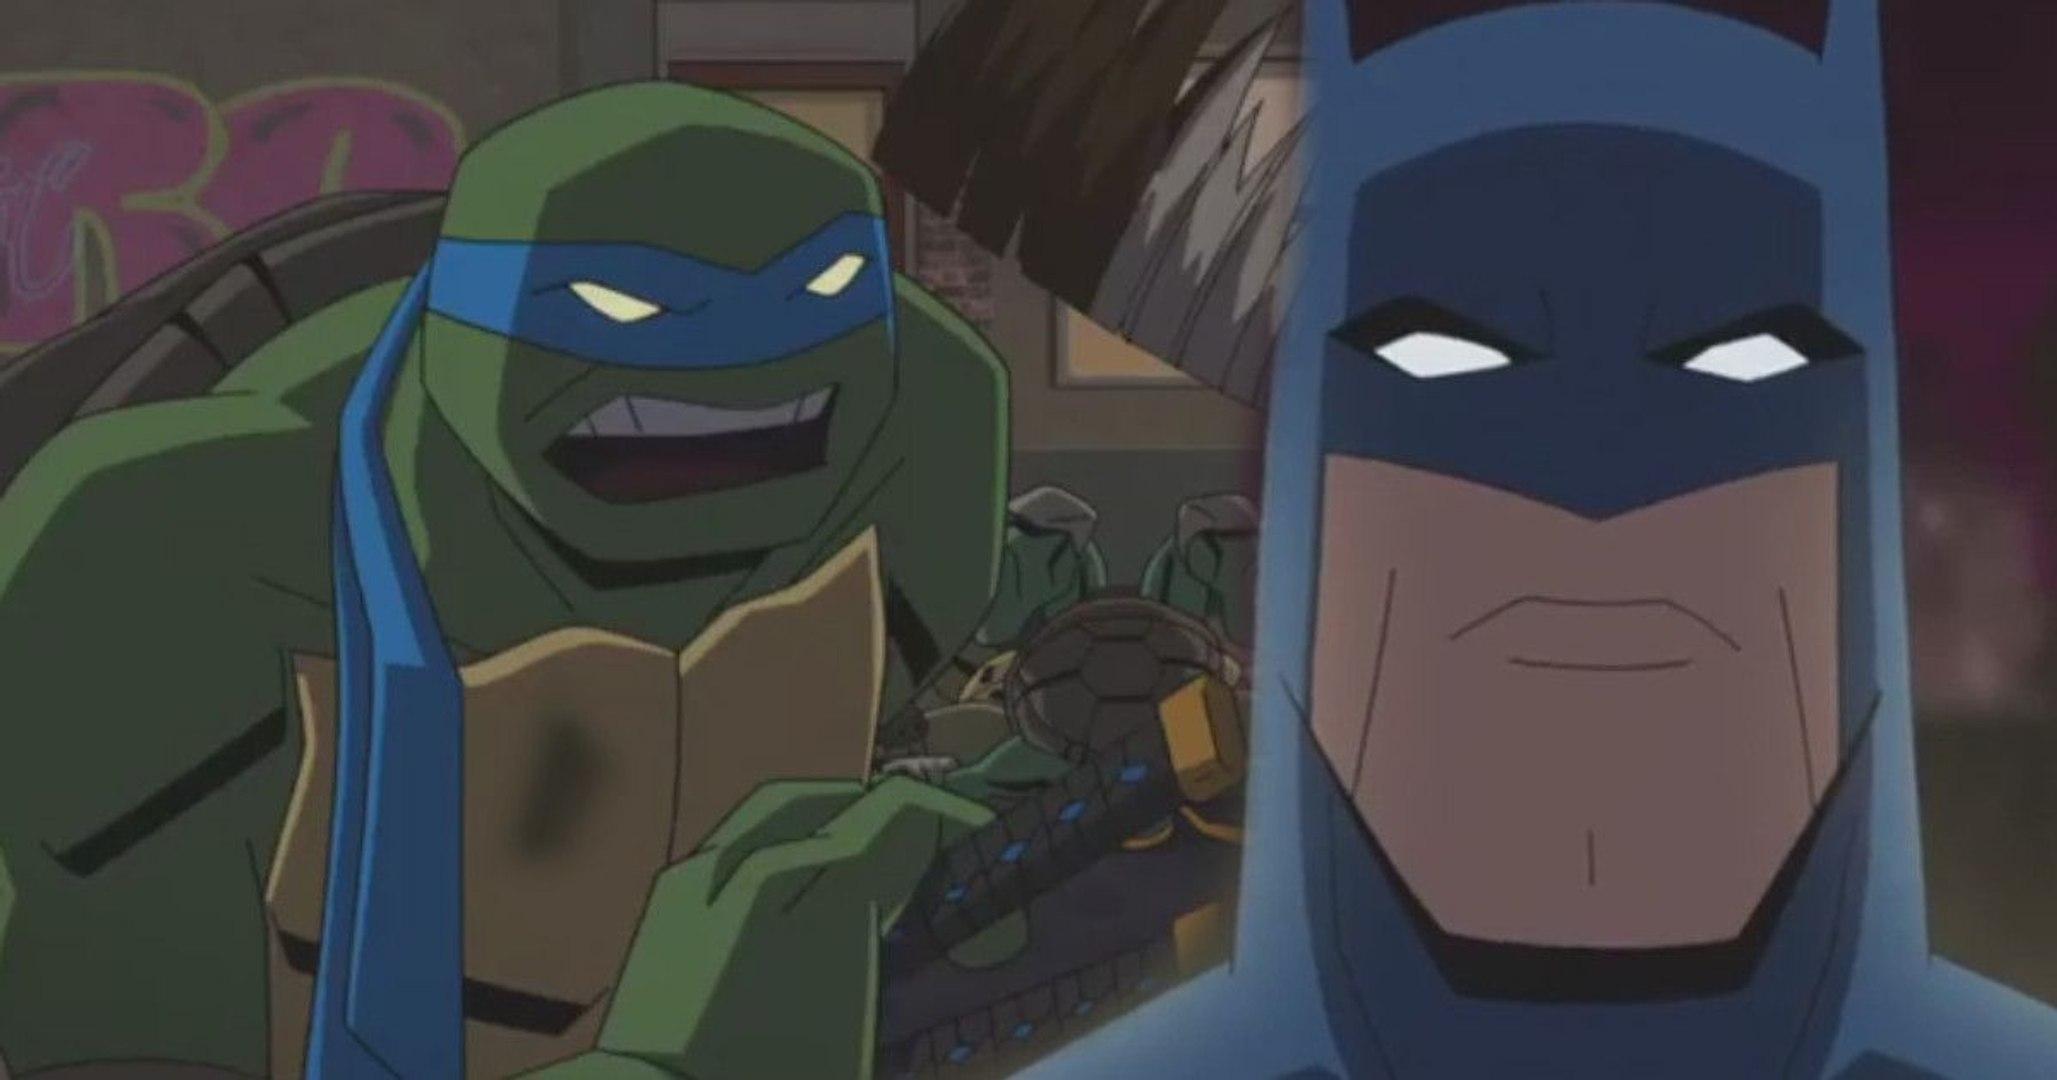 Batman Vs Teenage Mutant Ninja Turtles Official Trailer 2019 Video Dailymotion